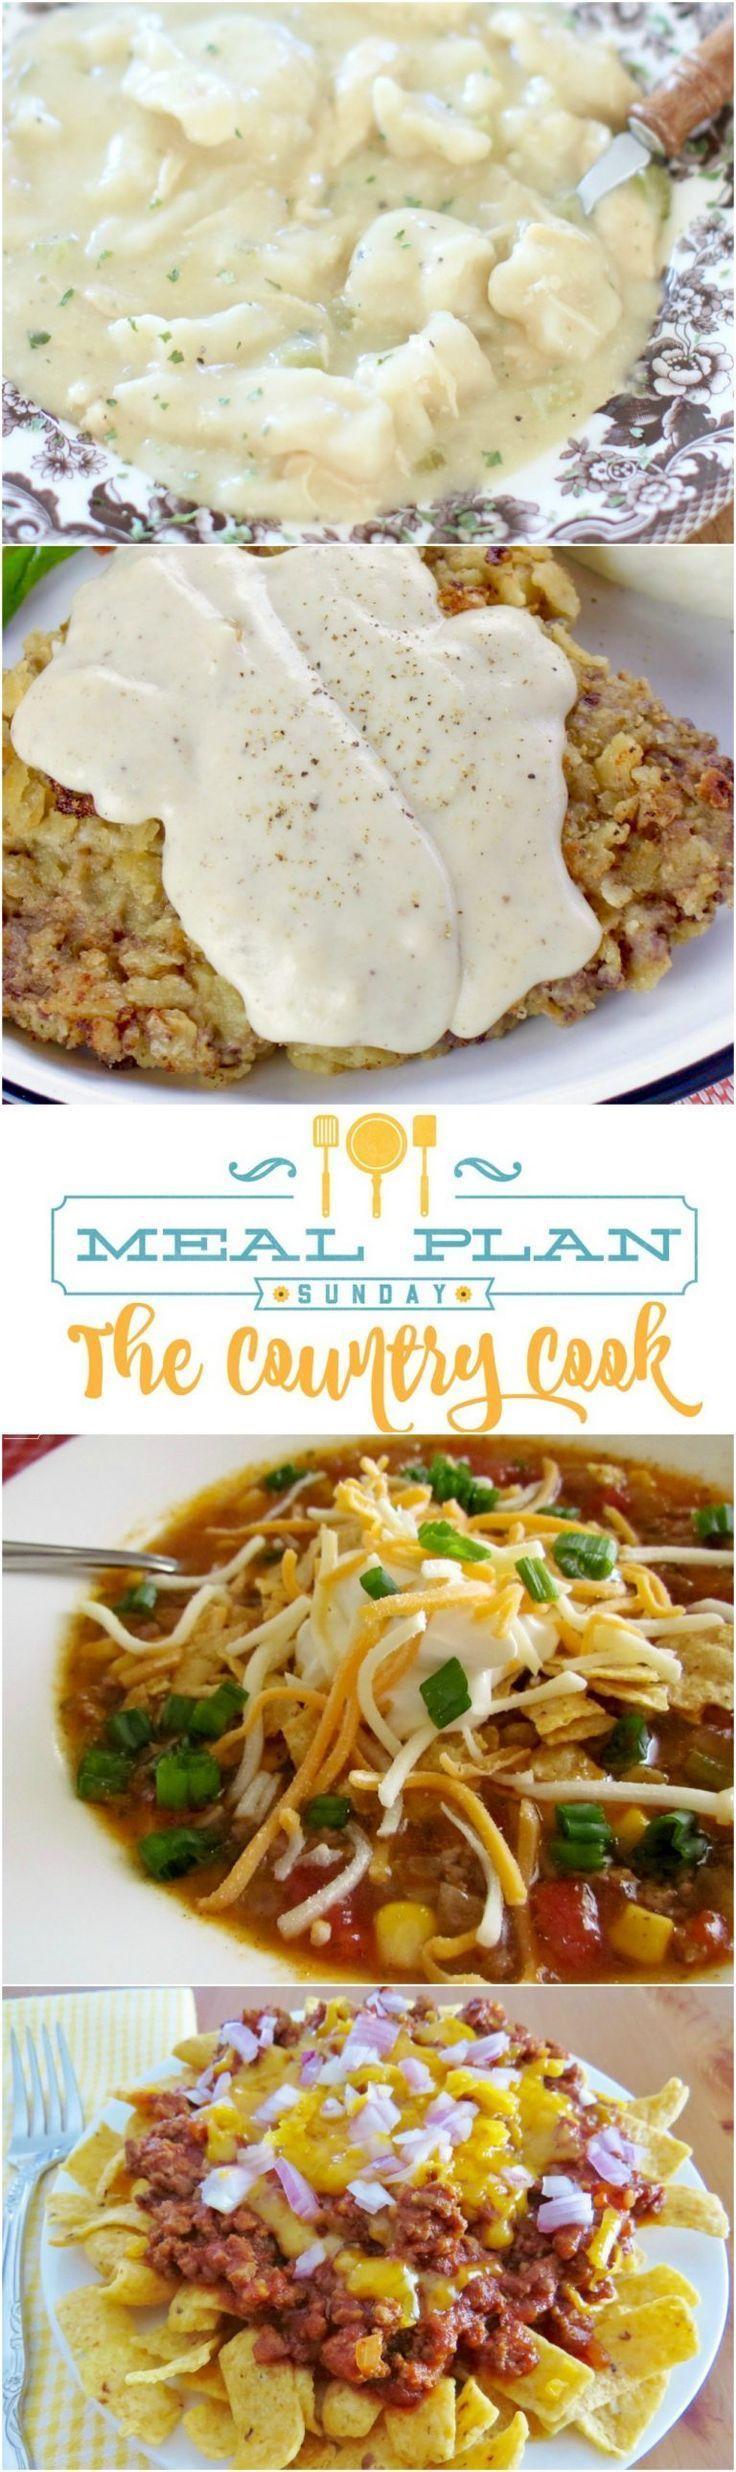 Meal Plan recipes include: Crock Pot Chicken & Dumplings ...